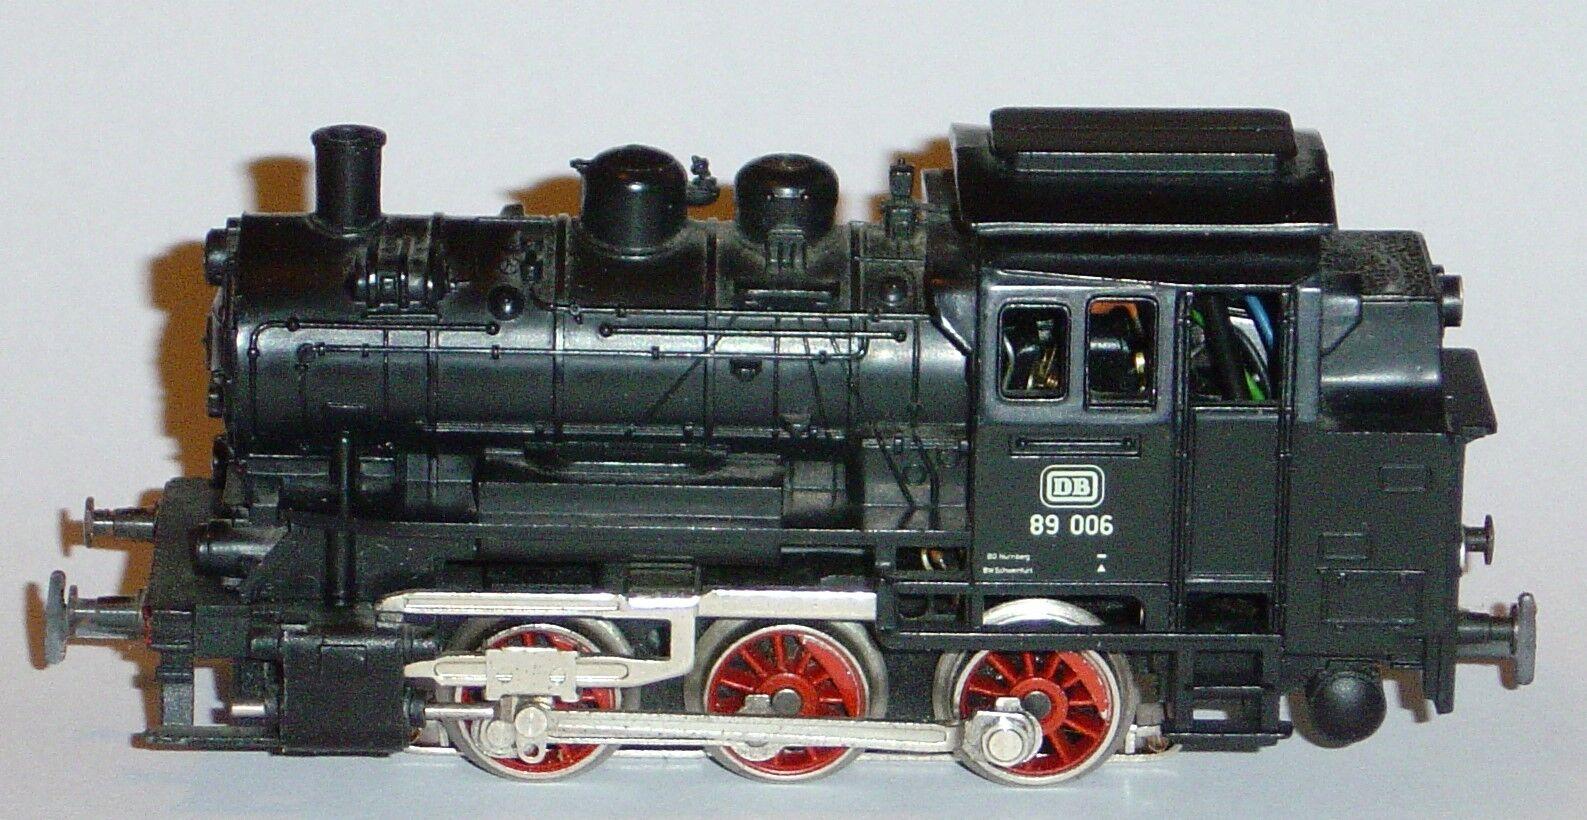 Marklin ho, steam locomotive Digital ref.3000 89006 (2),  decoder to choose